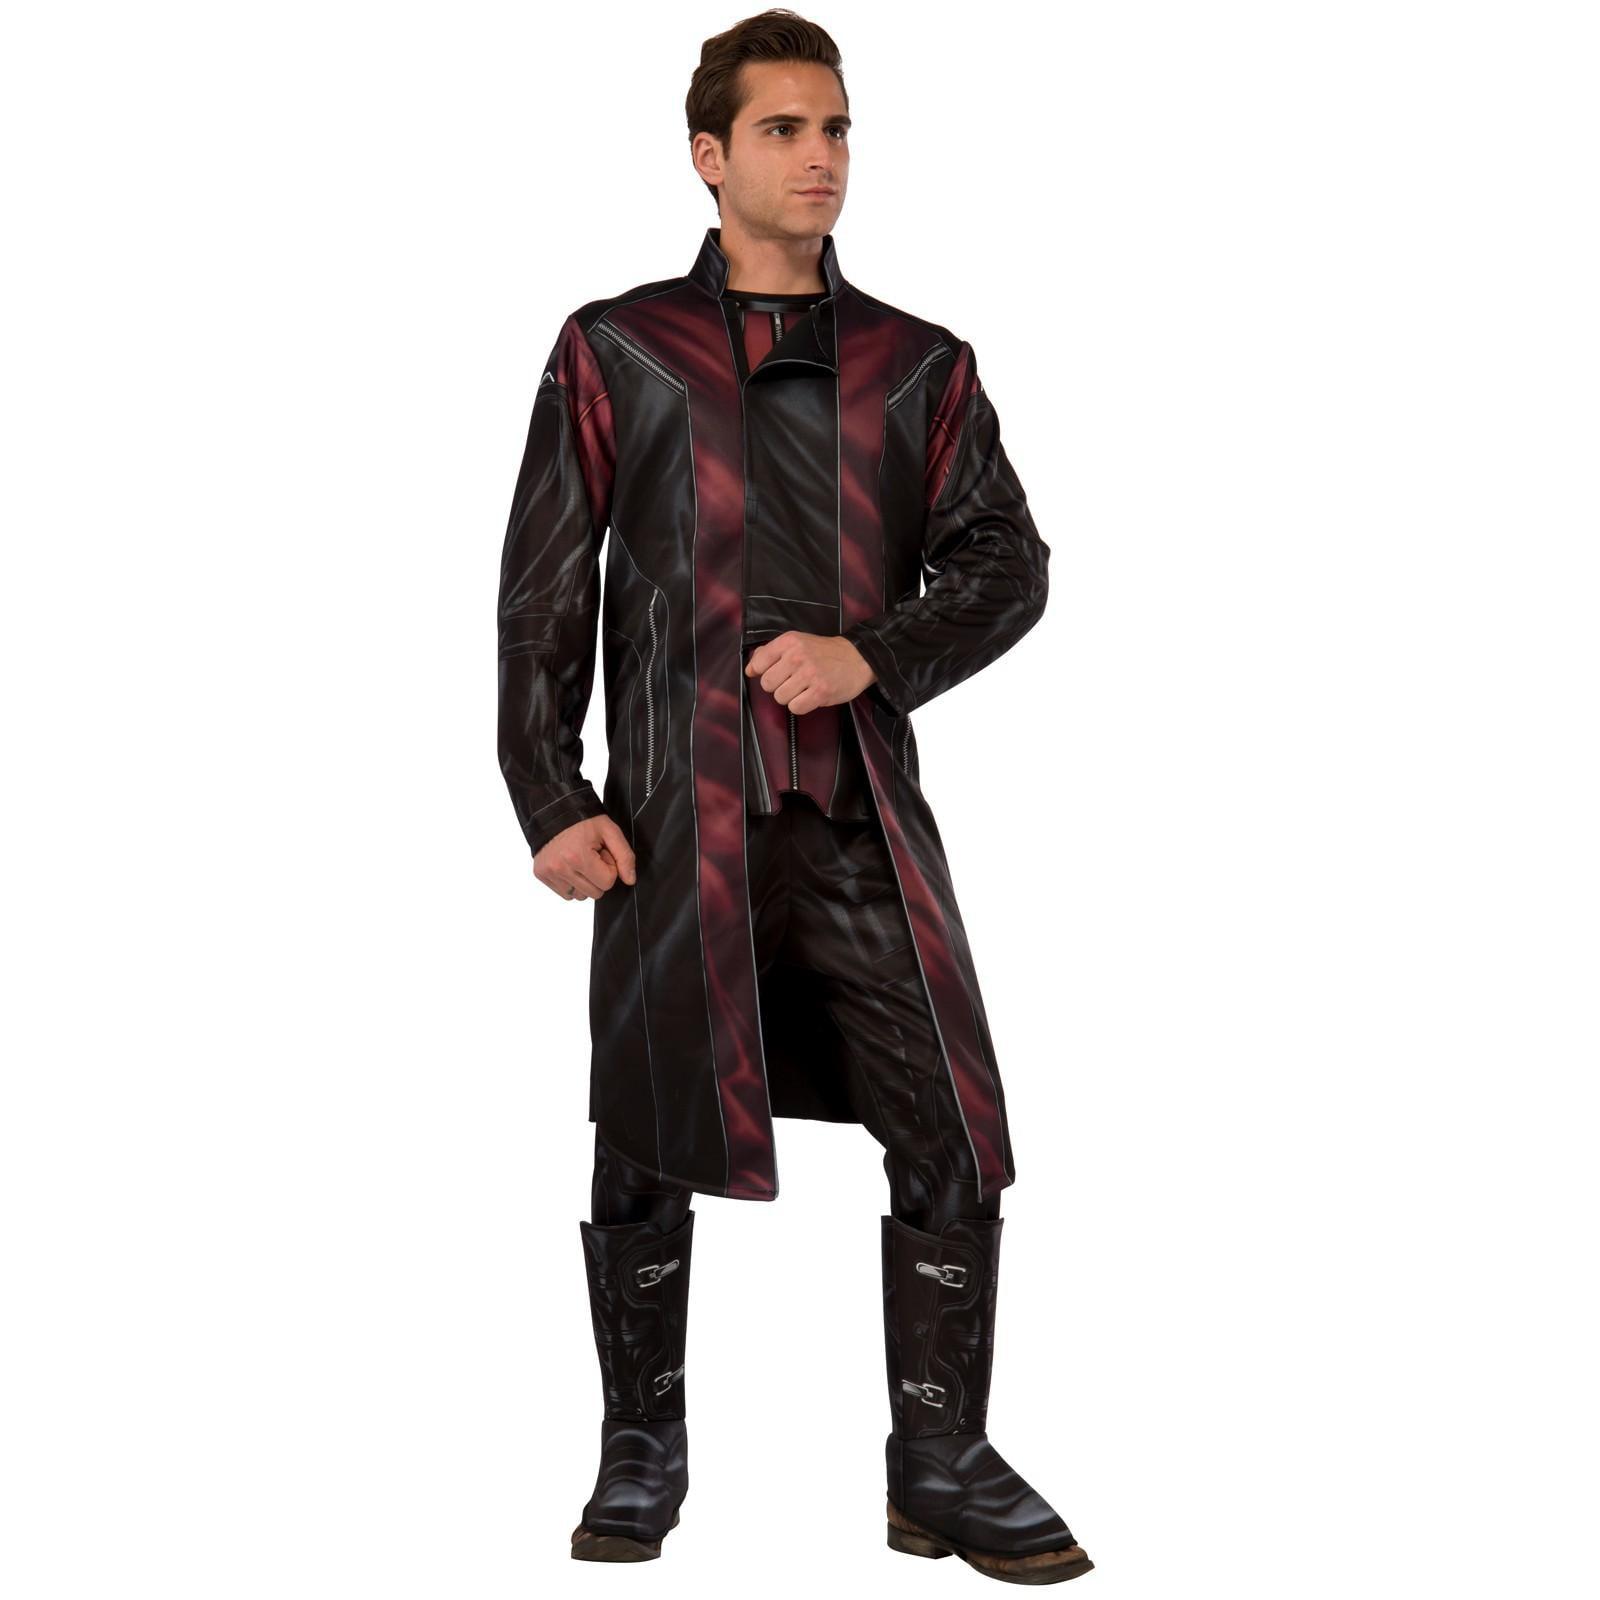 sc 1 st  Walmart & Avengers 2 Adult Deluxe Hawkeye Costume - Walmart.com